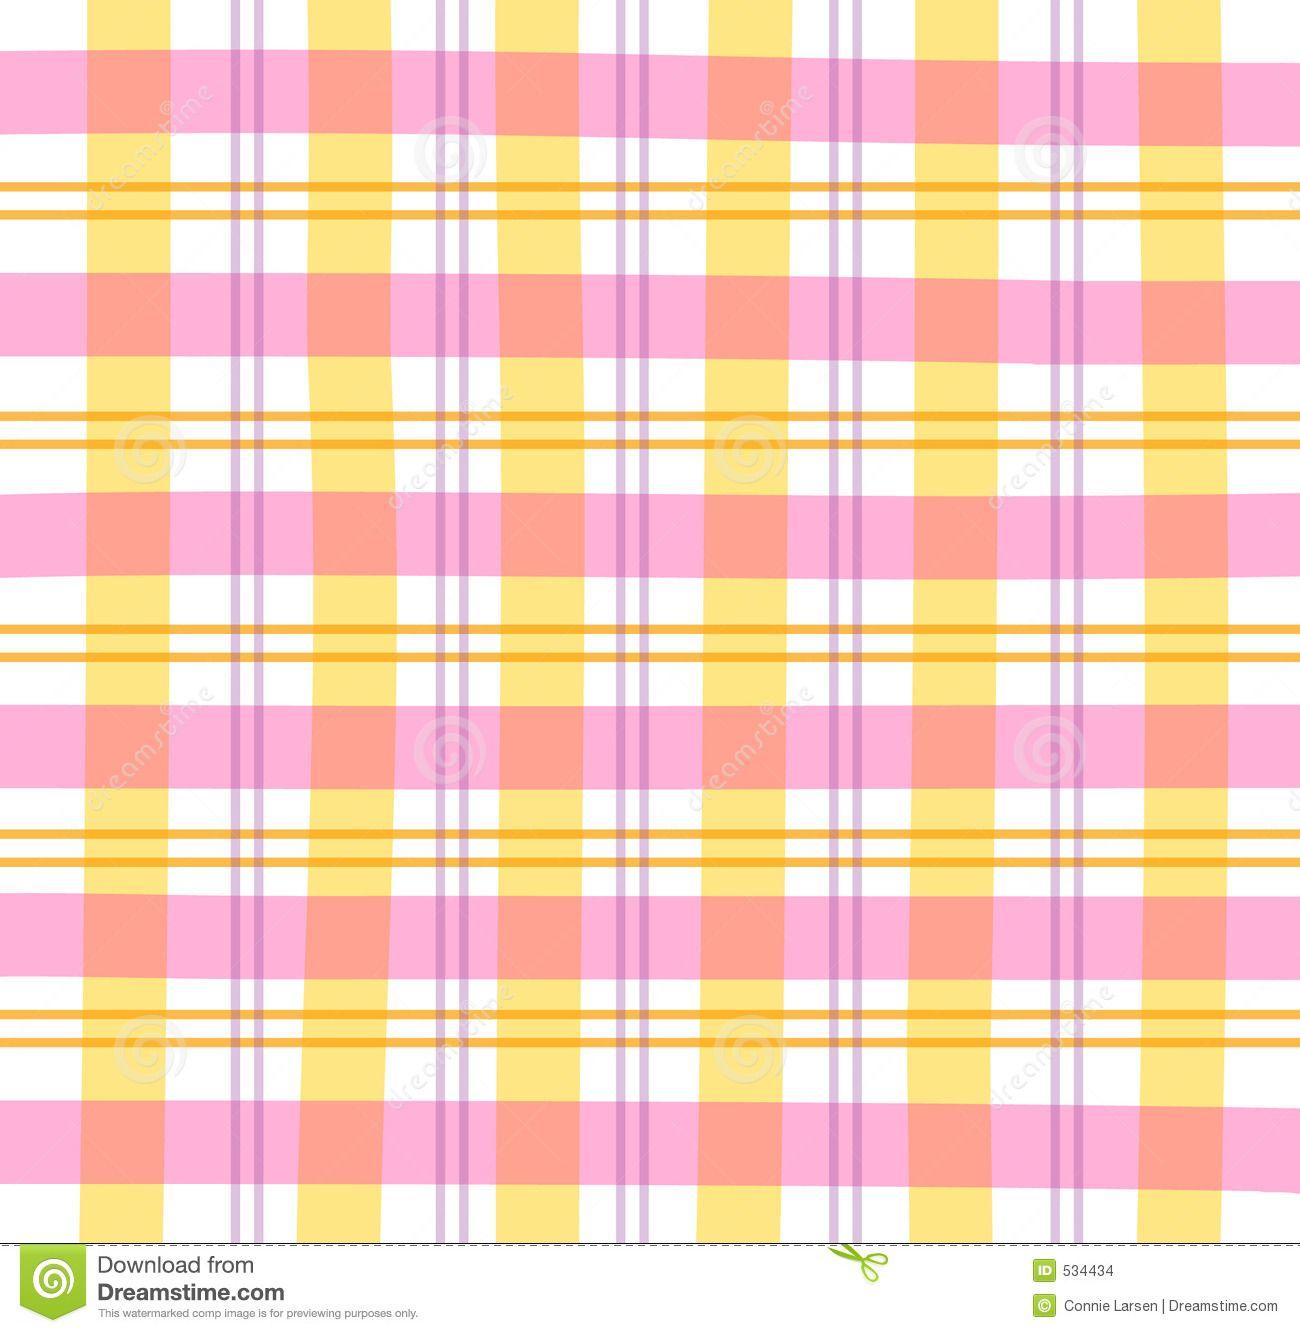 pastel plaid ilustraci n de un modelo en colores pastel rosado anaranjado p rpura plaids. Black Bedroom Furniture Sets. Home Design Ideas